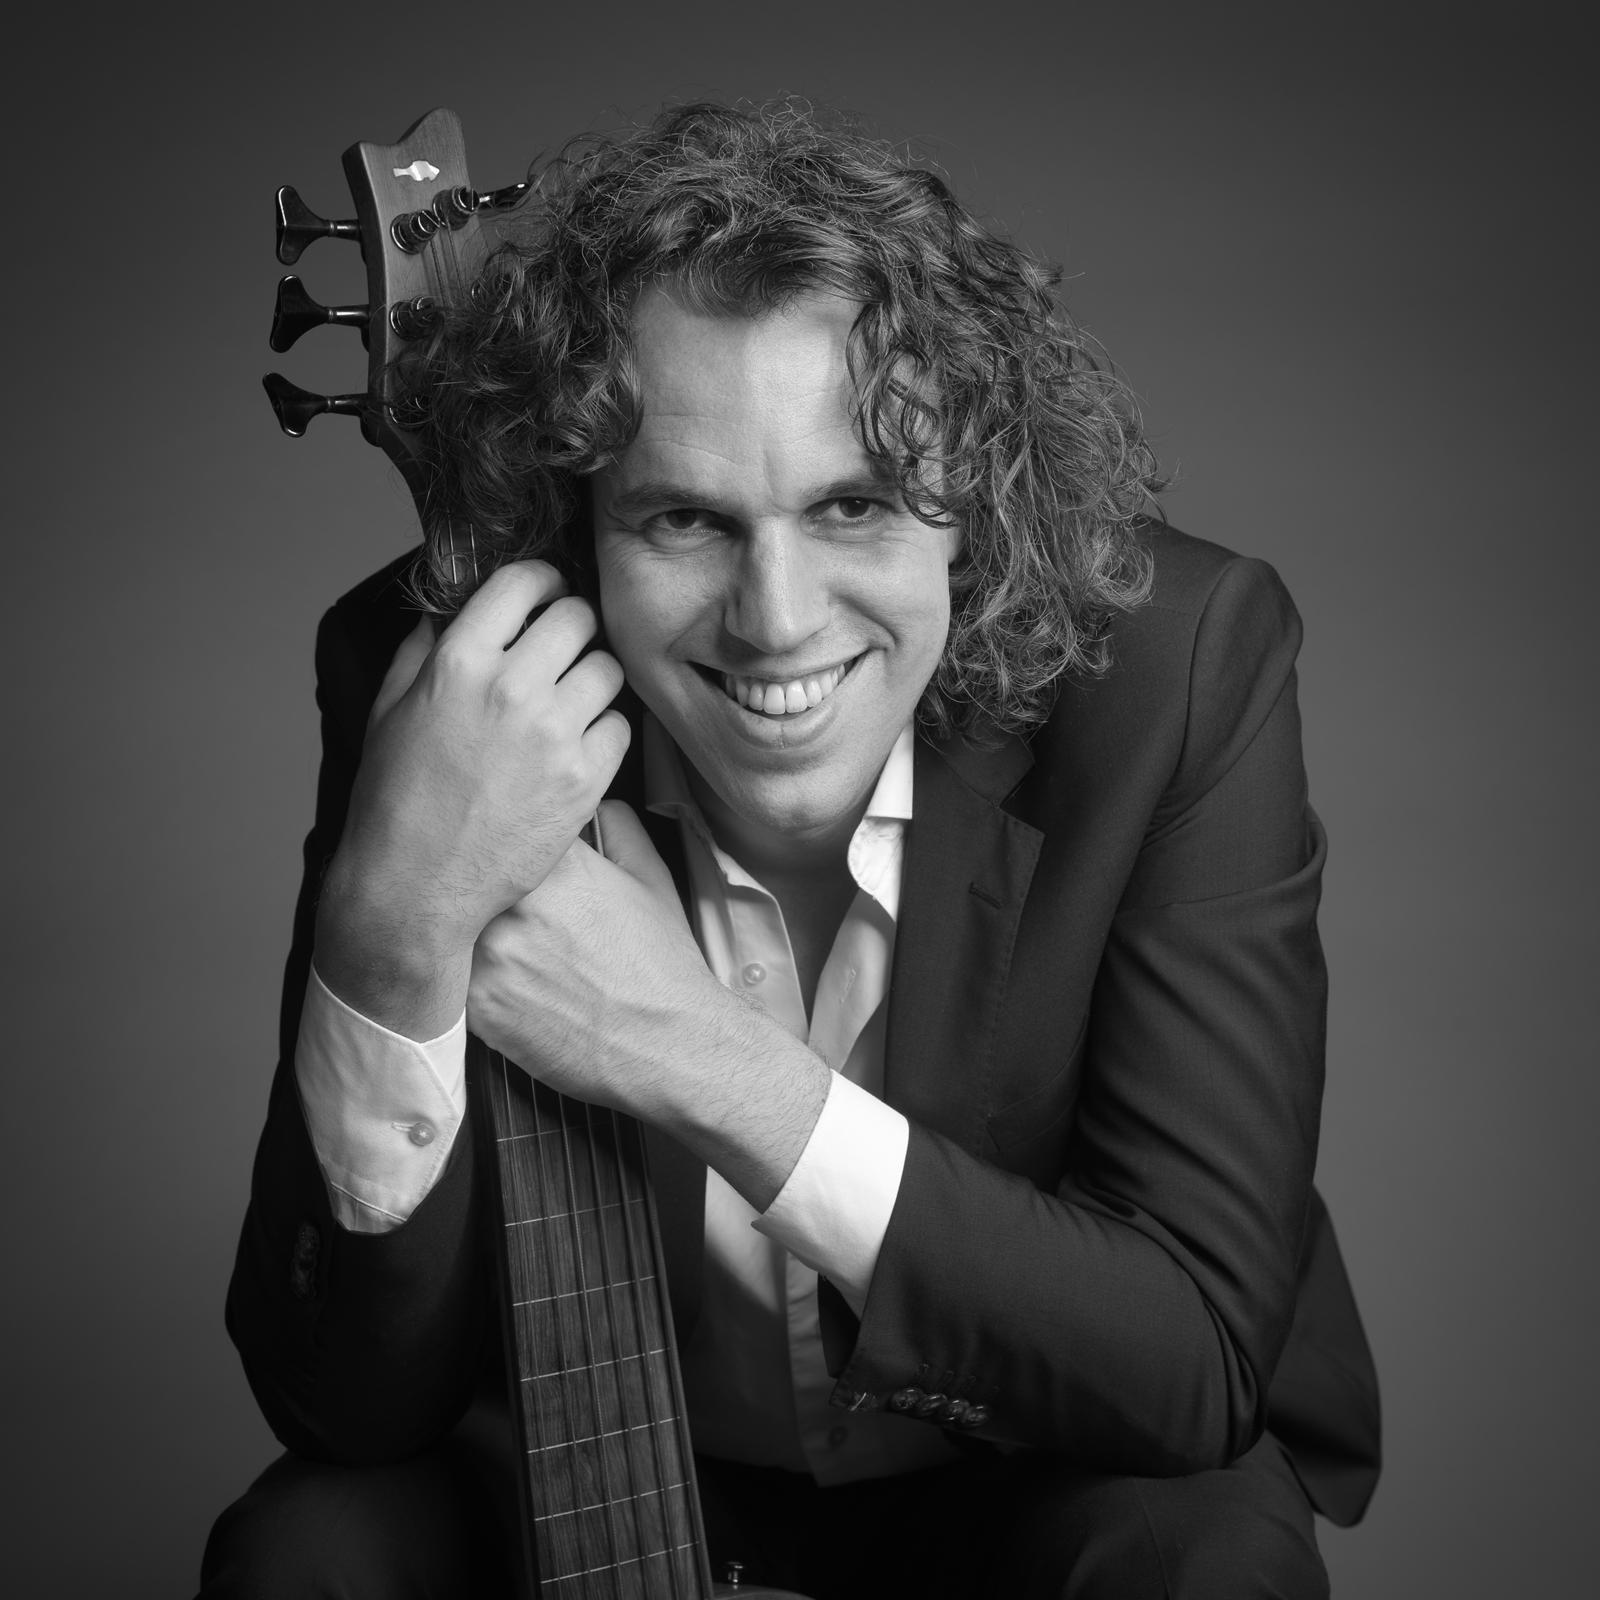 Portret van lachende muzikant met bas